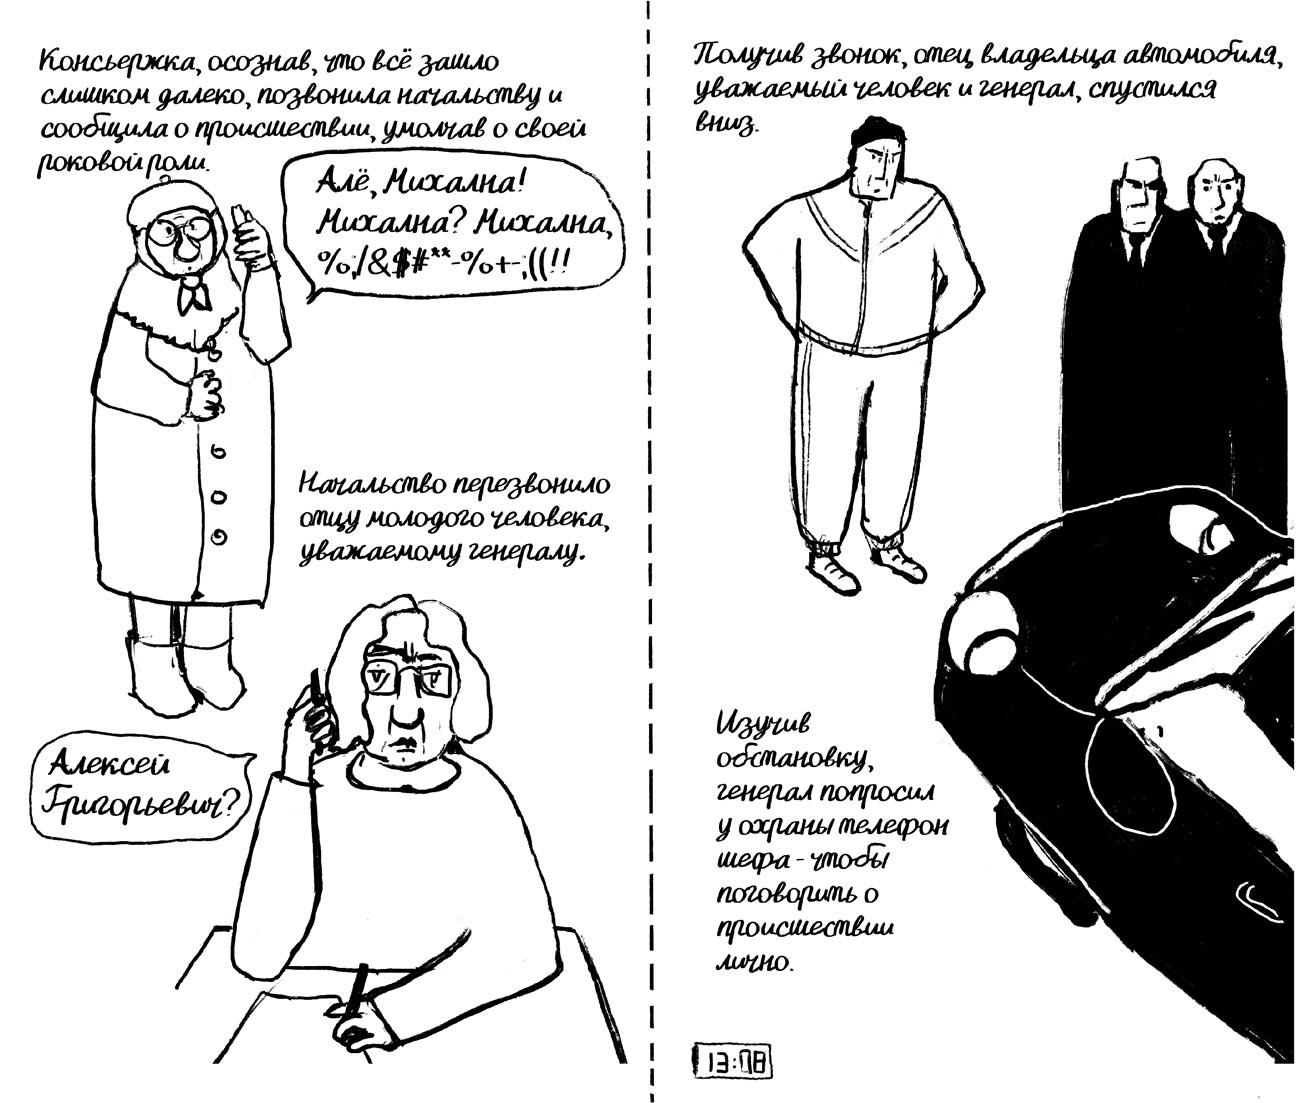 comisc yard 07 - <b>Драма на парковке.</b> Комикс Тани Кремень про кумовство и коррупцию - Заборона